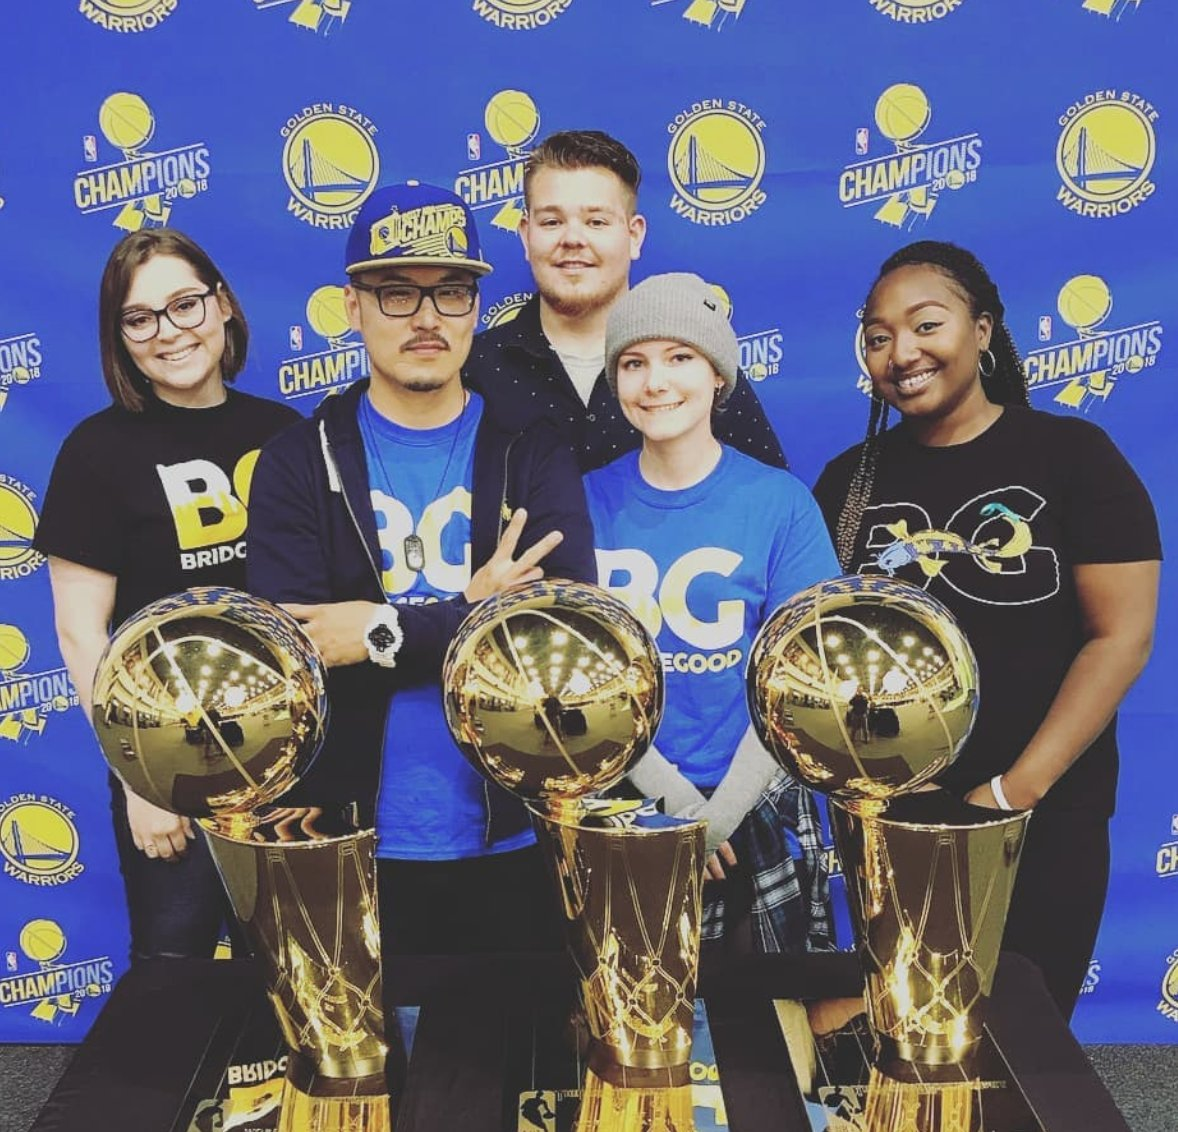 BIG TINGS with #BRIDGEGOOD + #OAKLANDDIGITAL  Take time to be thankful of experiences and memories we build, together. #Team @OaklandDigital + @BRIDGEGOOD | #ODsquadd x #BGsquadd x #DubNation  x #WarriorsGround x #GoldenState x #Warriors x  http://www. bridgegood.com  &nbsp;  <br>http://pic.twitter.com/qTIF3xVpeD